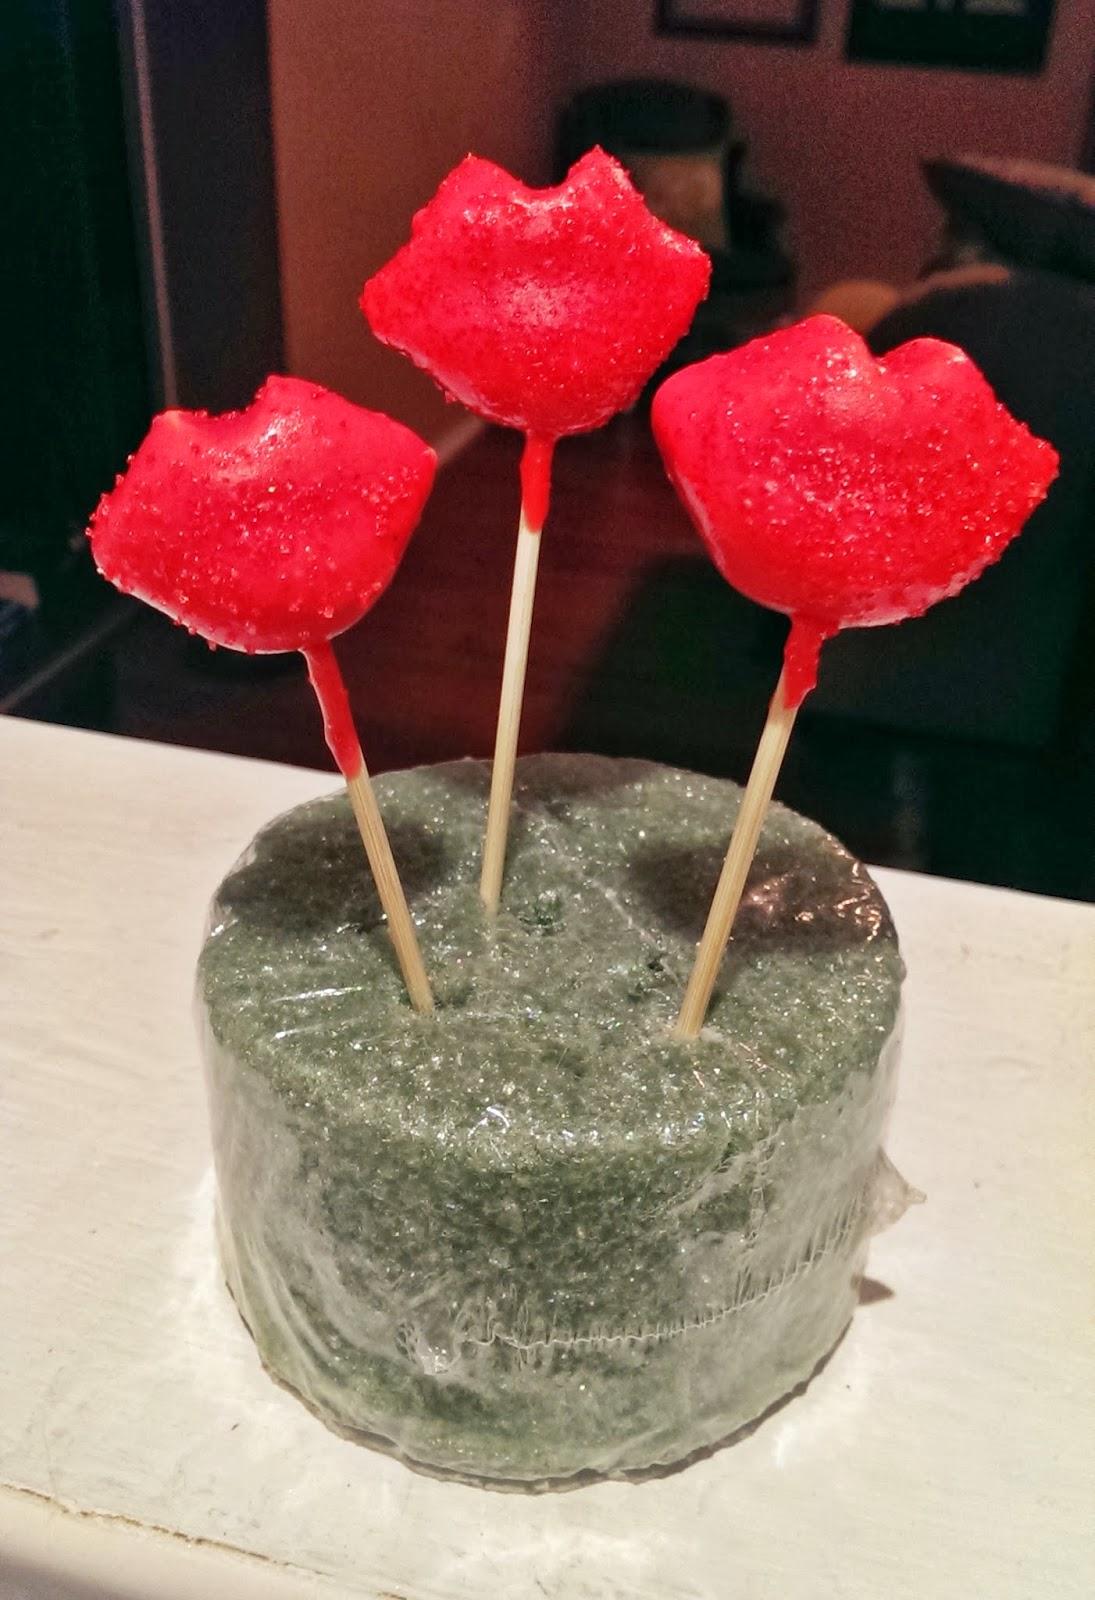 meg made creations red lips cake pops recipe decorating instructions. Black Bedroom Furniture Sets. Home Design Ideas